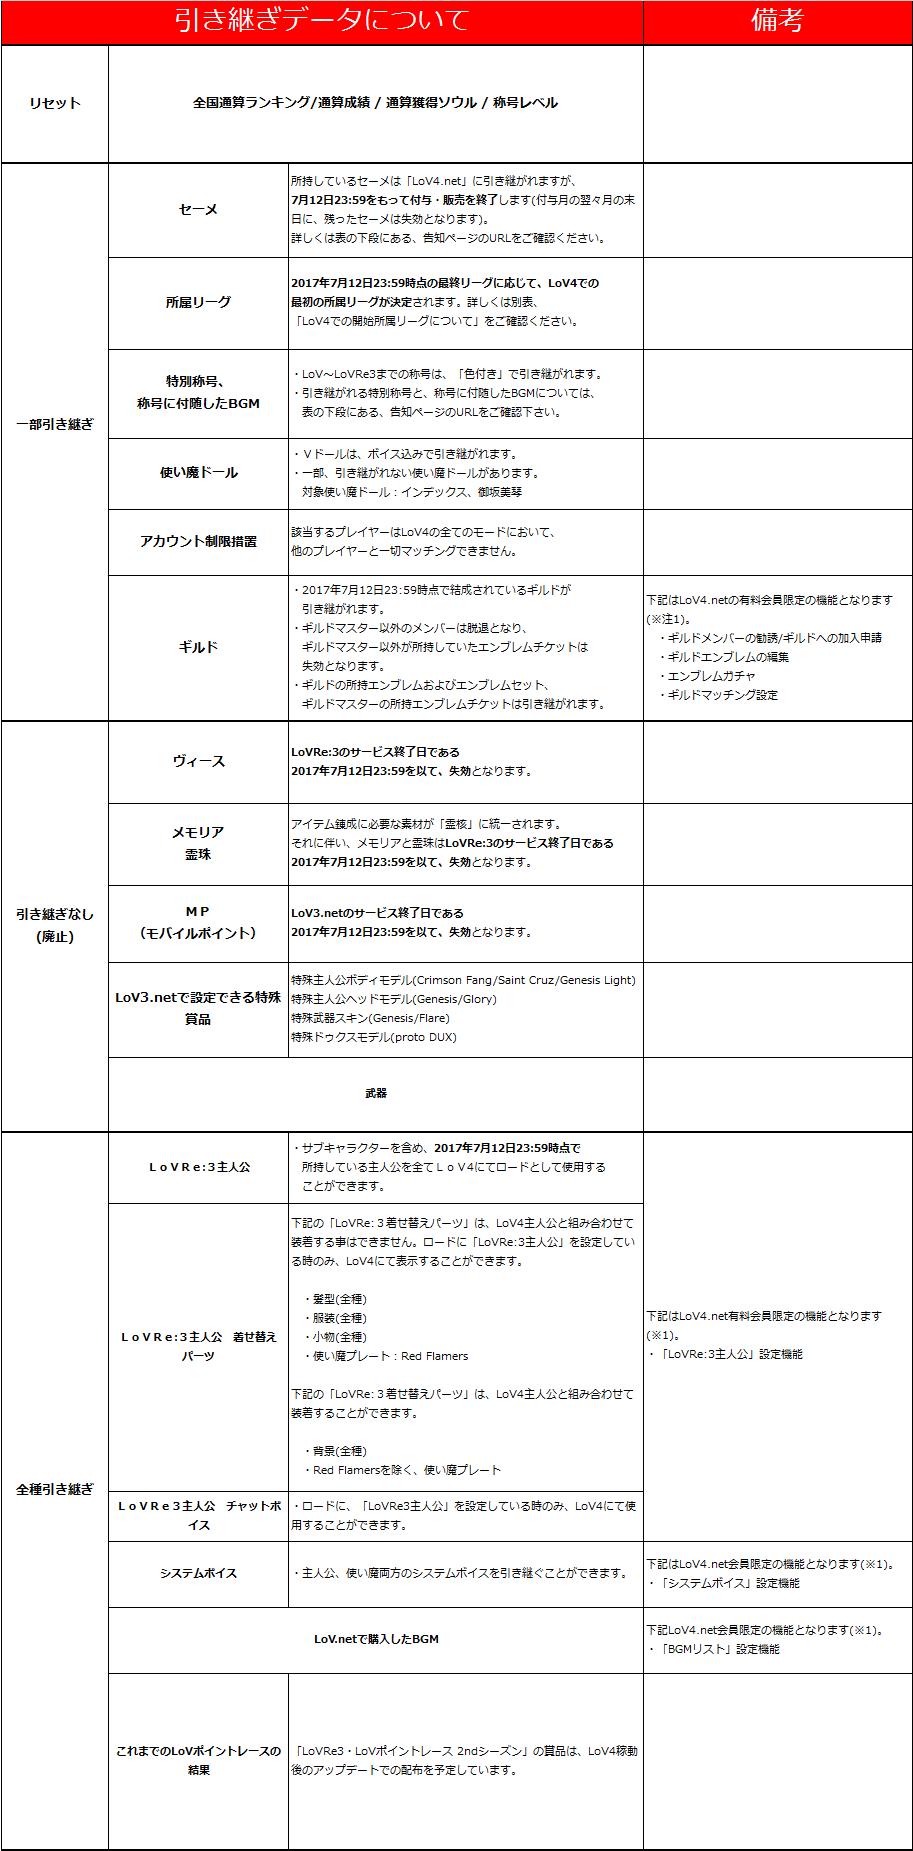 LoV4_引継ぎ表_2.png